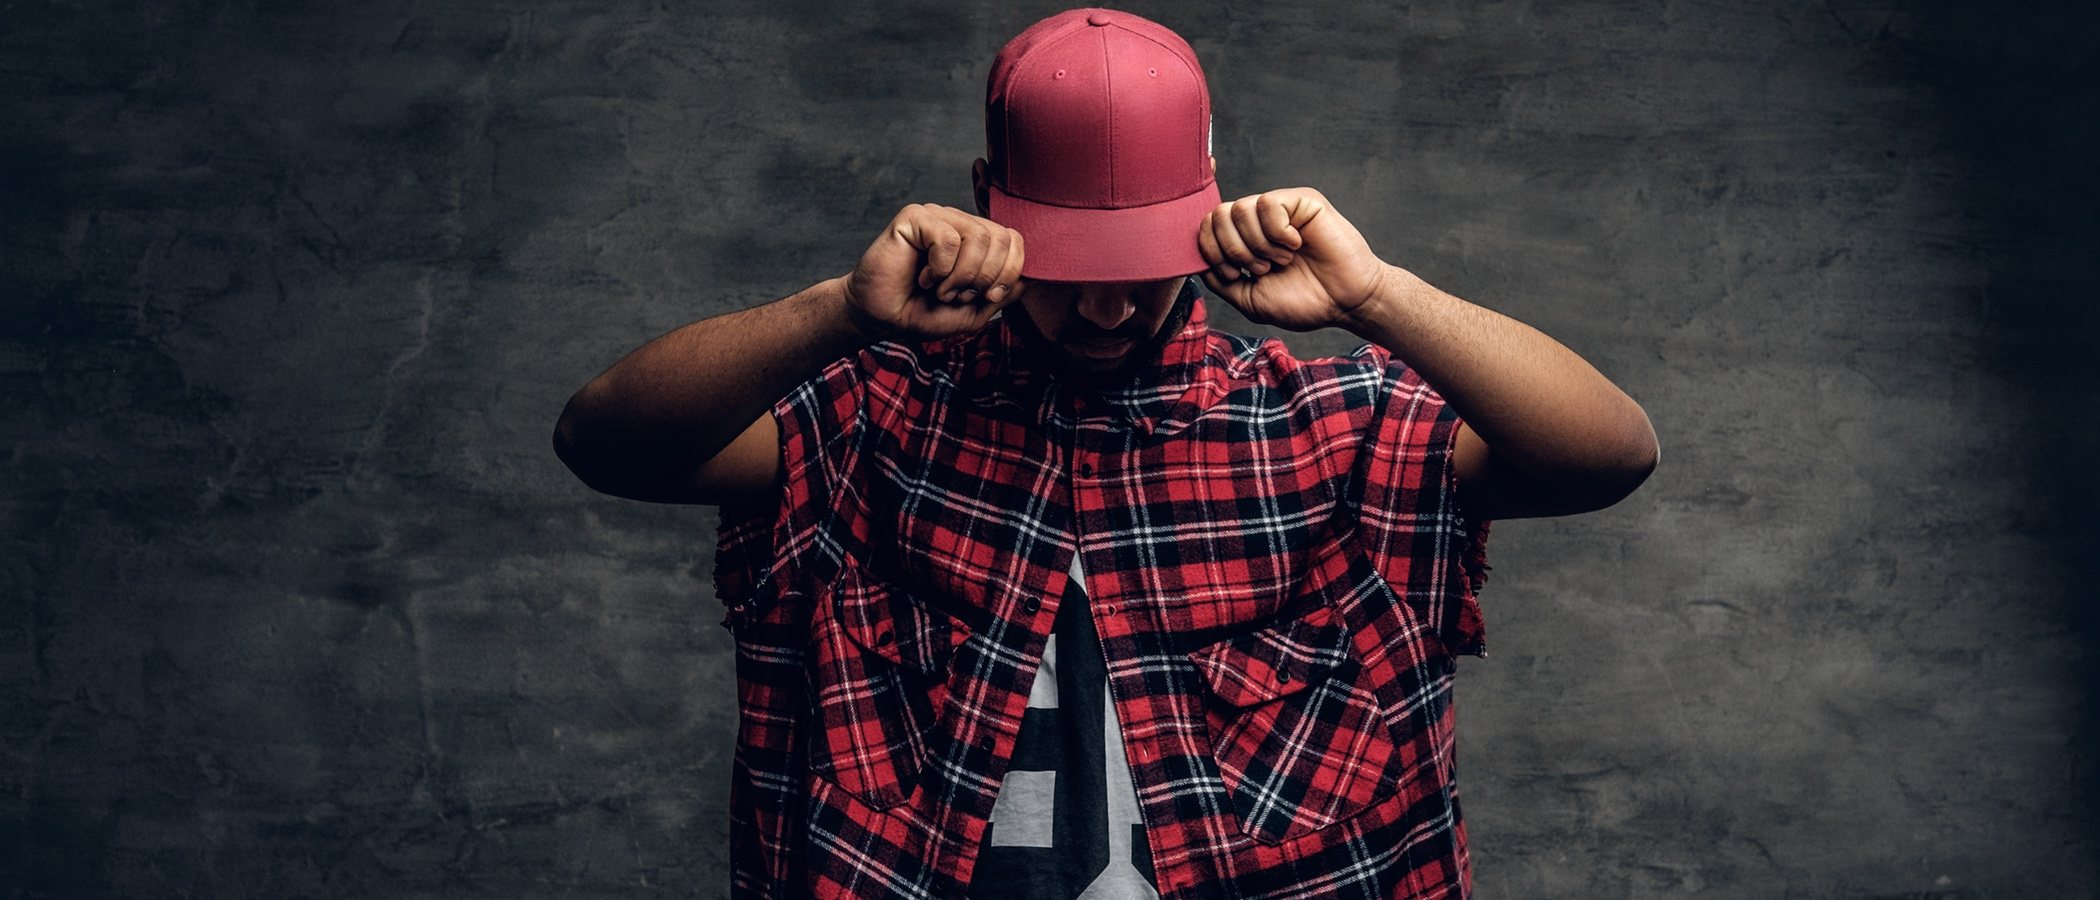 Moda hombre: Tendencias para primavera 2018